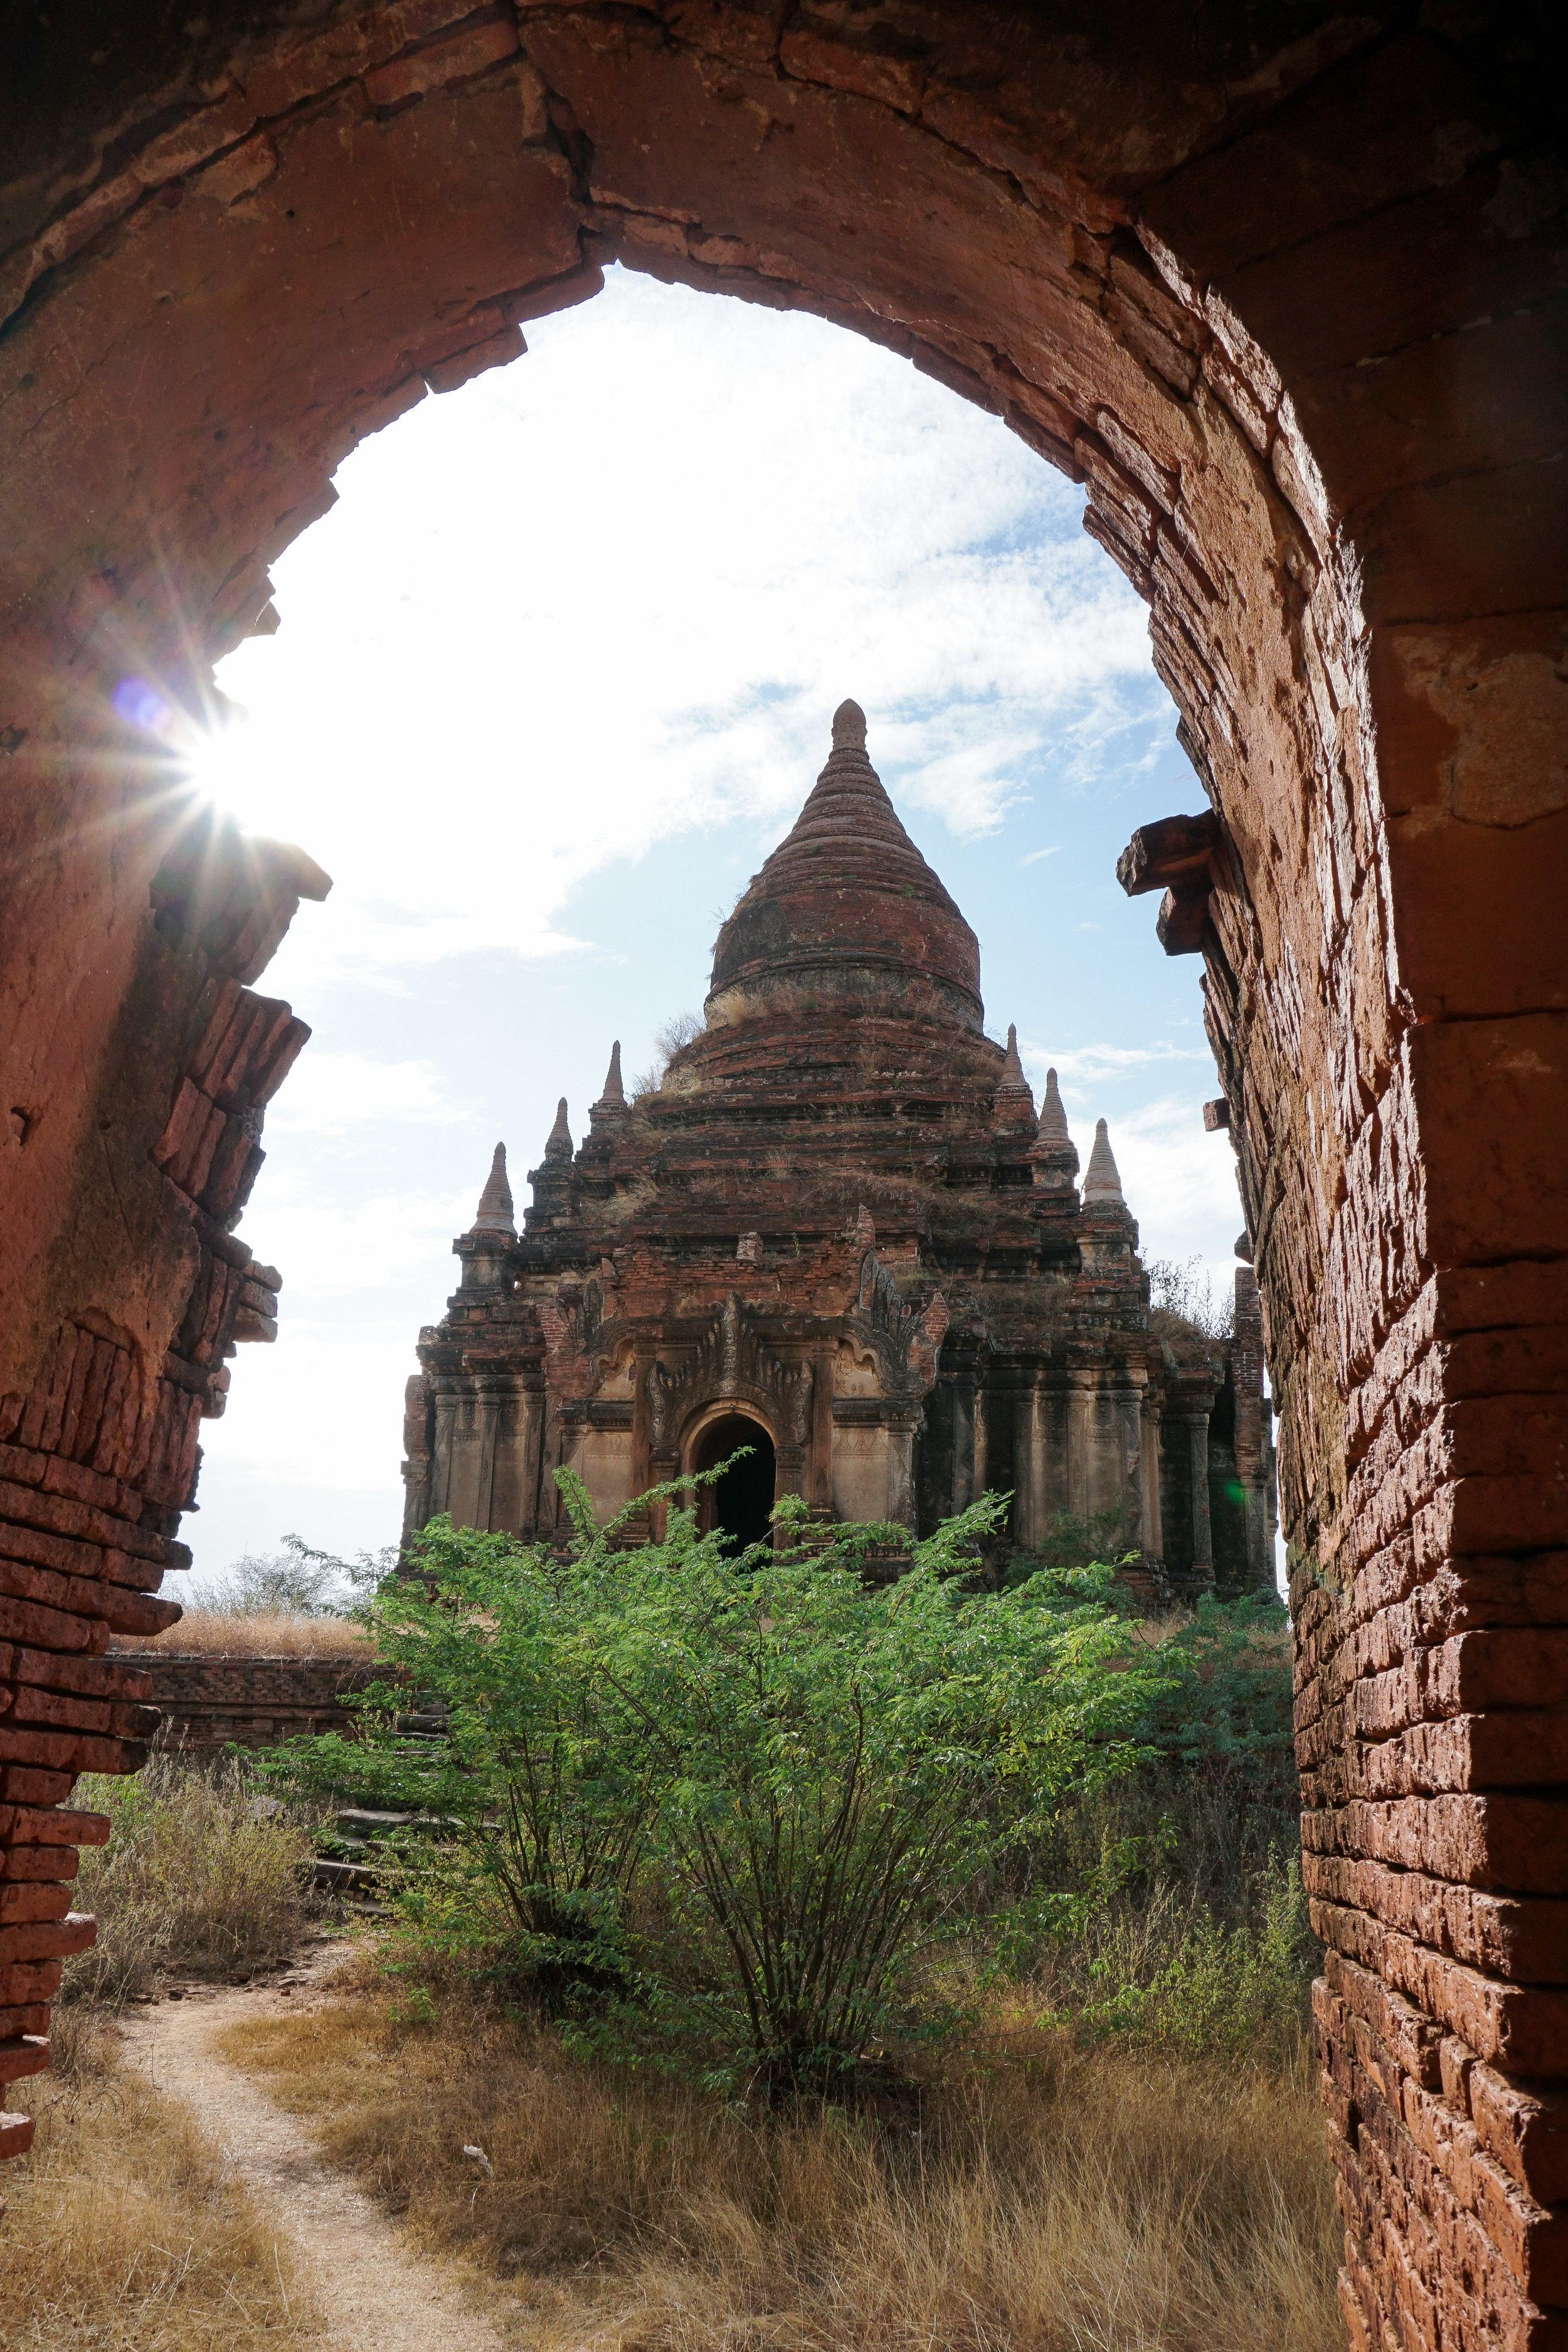 MYANMAR, ASIA